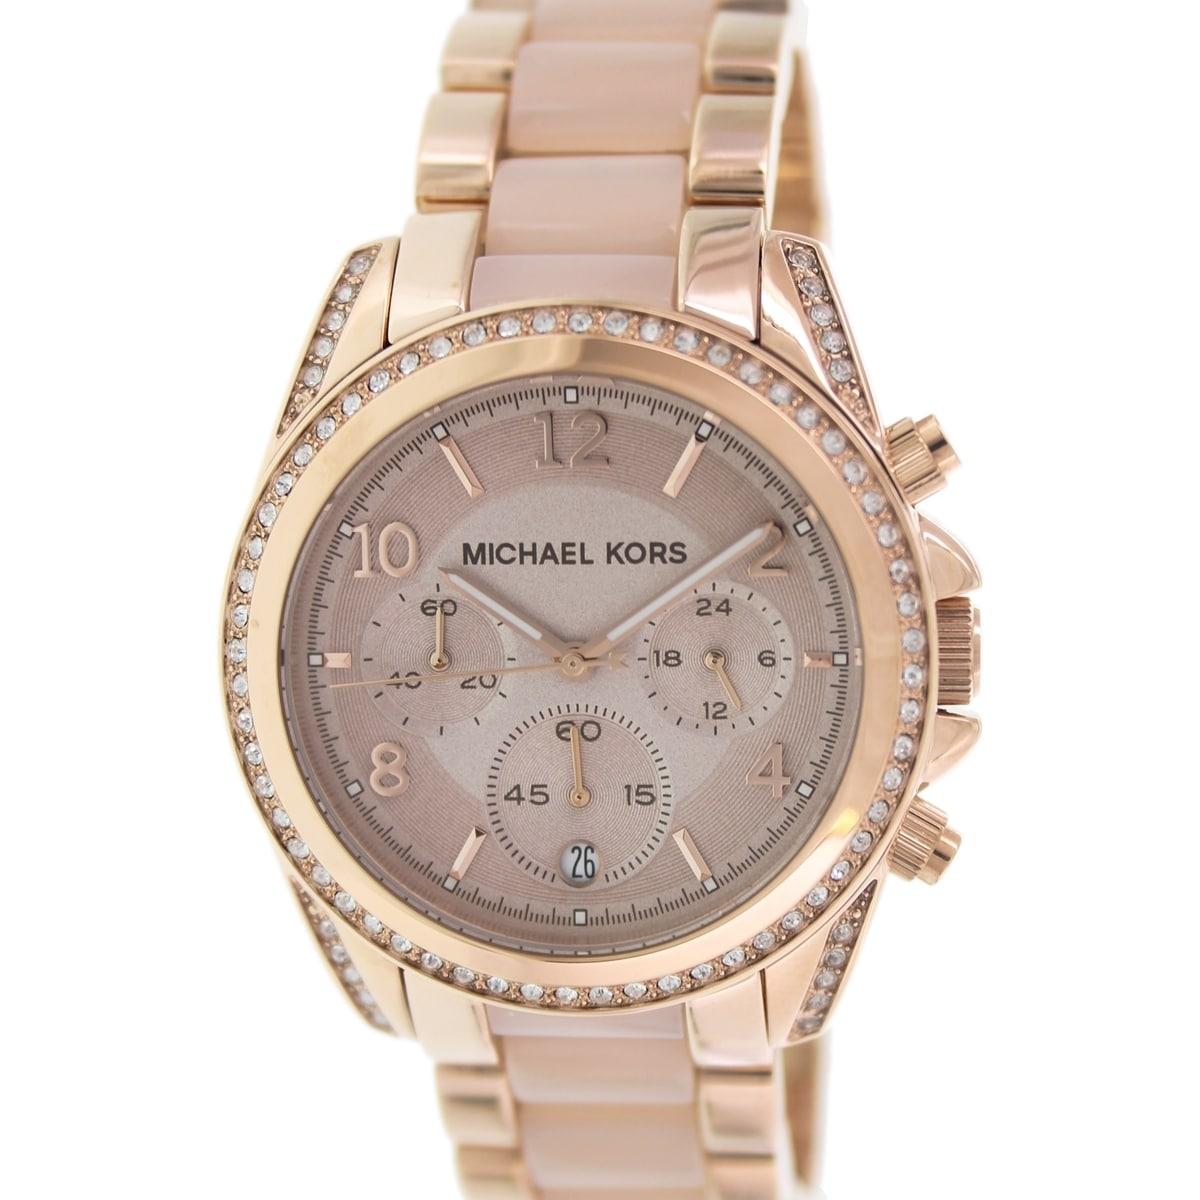 58f464c87073 Shop Michael Kors Women s MK5943 Blair Rose Goldtone Glitz Chronograph Watch  - Free Shipping Today - Overstock - 9188760